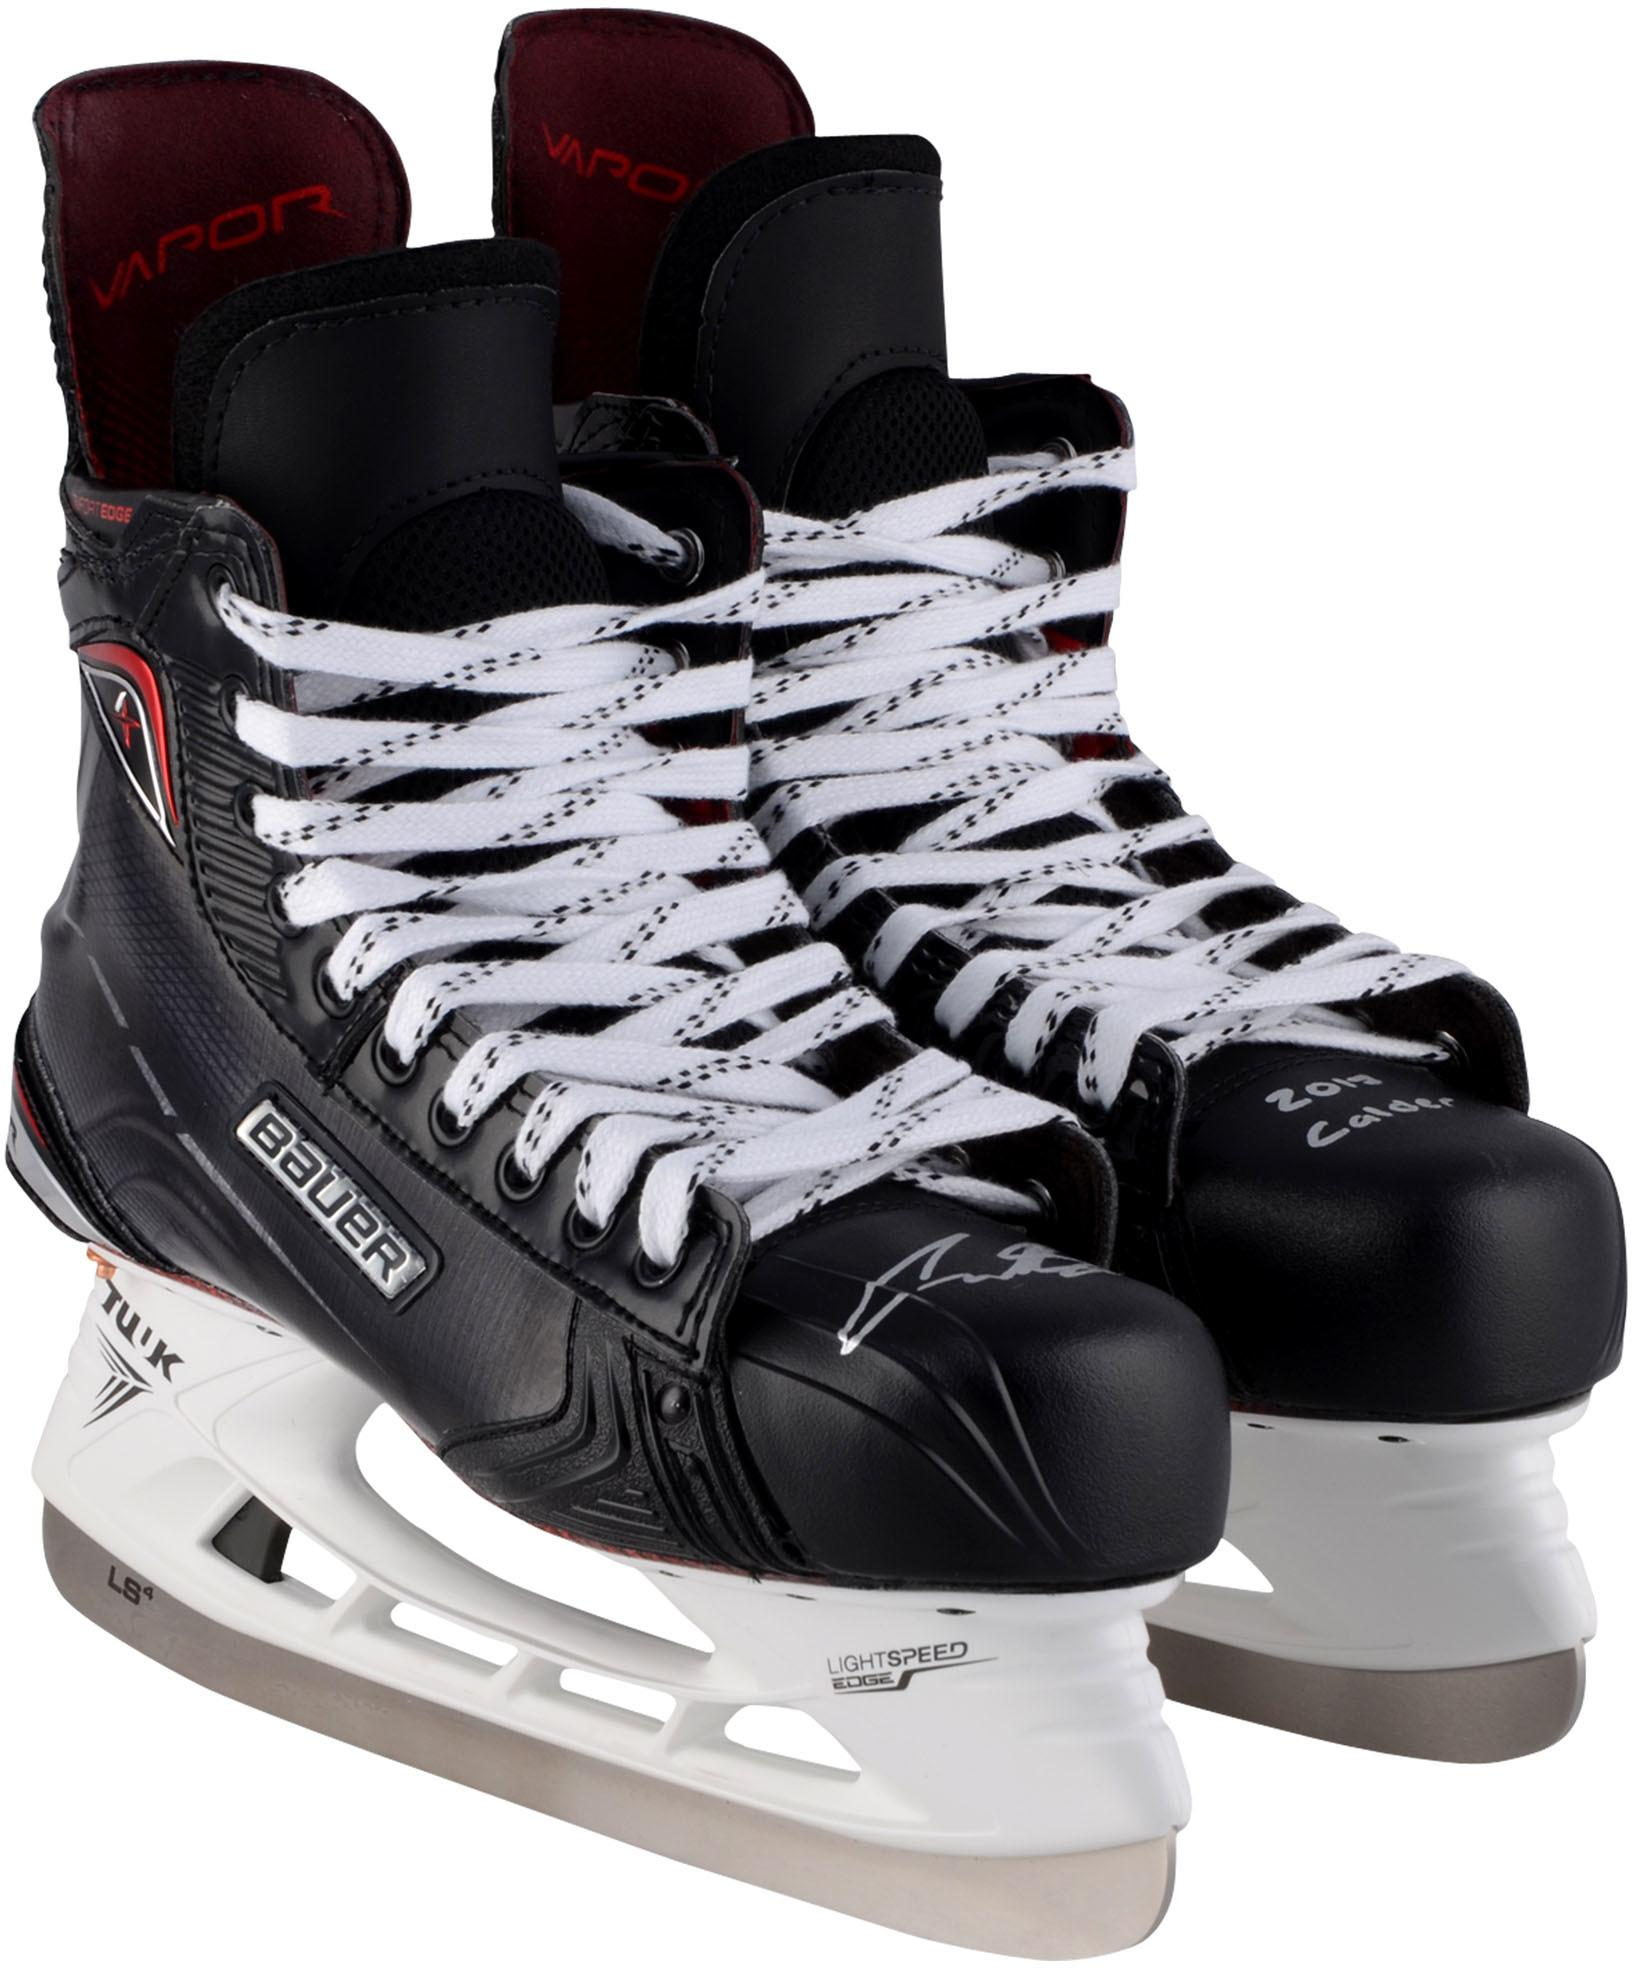 Auston Matthews Toronto Maple Leafs Autographed Bauer Nexus Game Model Skates with 2017 Calder Inscription Fanatics... by Fanatics Authentic